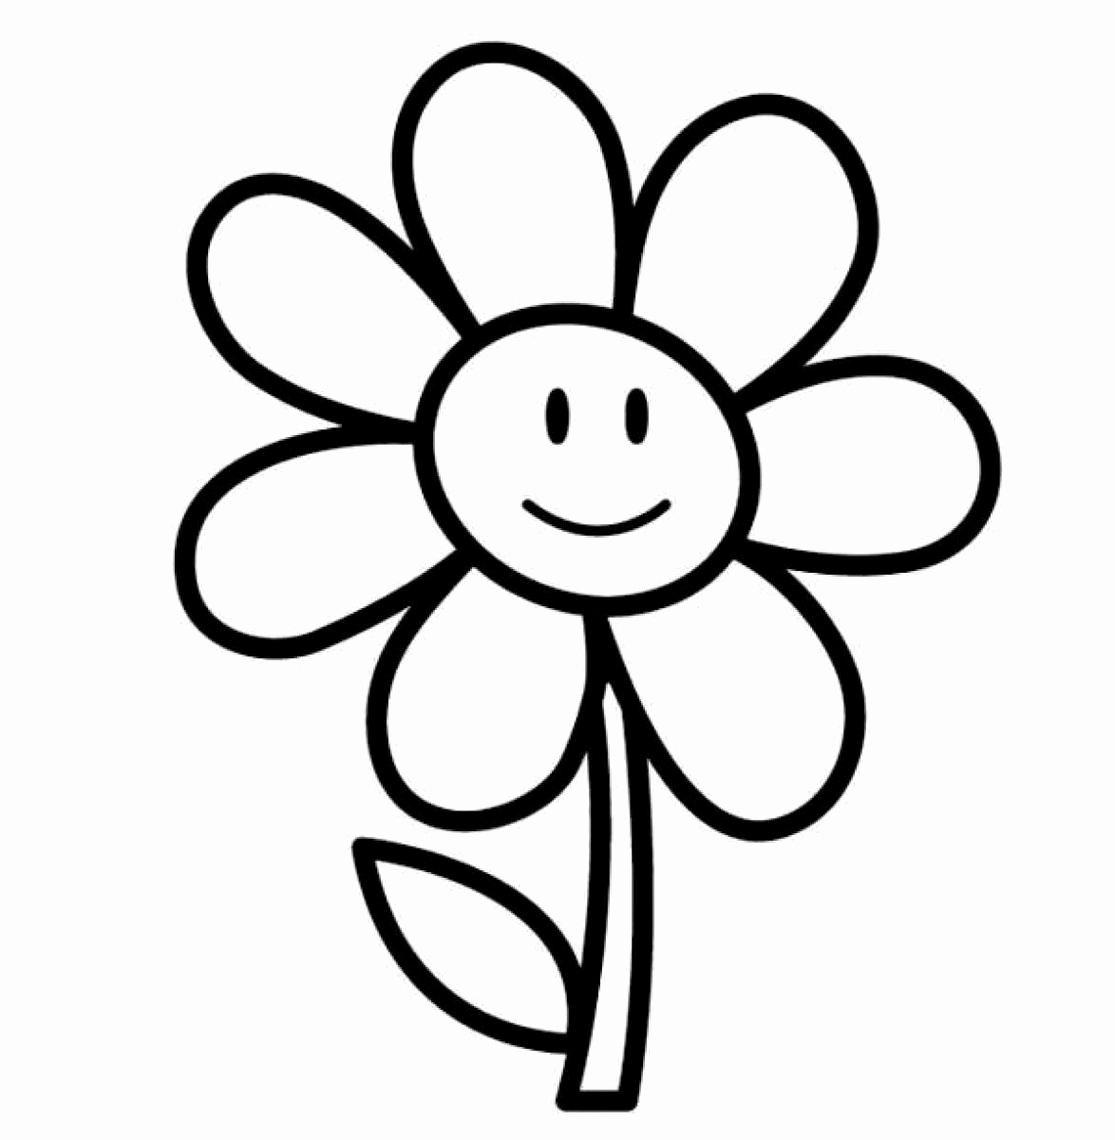 Black and White Flower Drawings Elegant Black and White Flower Clipart Free Best Black Clip Art Library